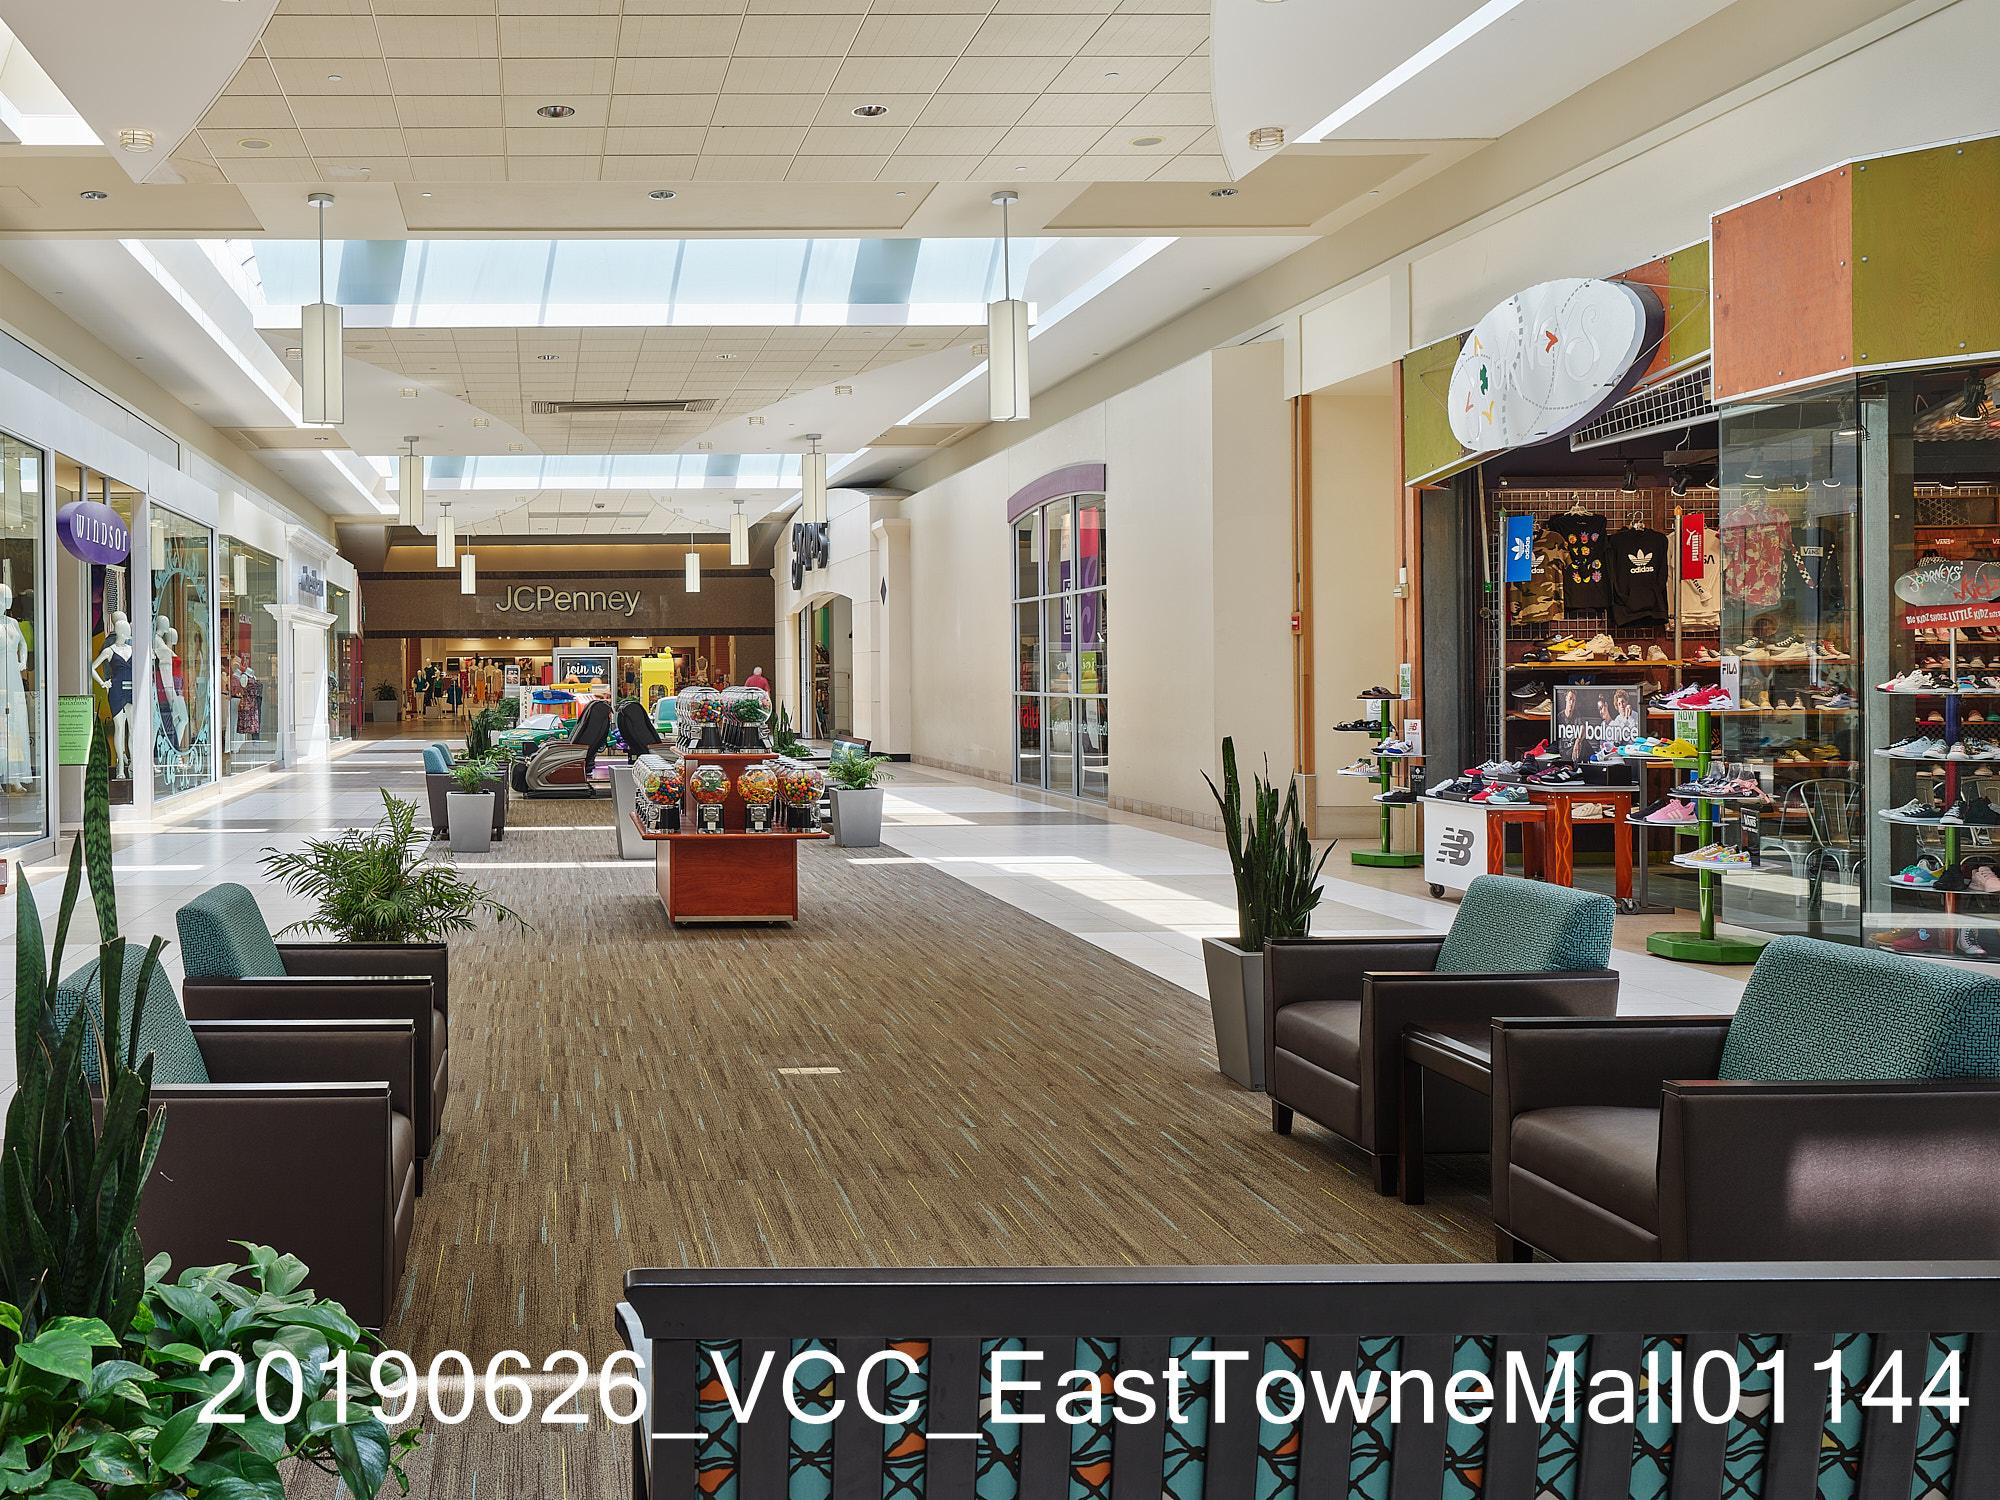 20190626_VCC_EastTowneMall01144.jpg